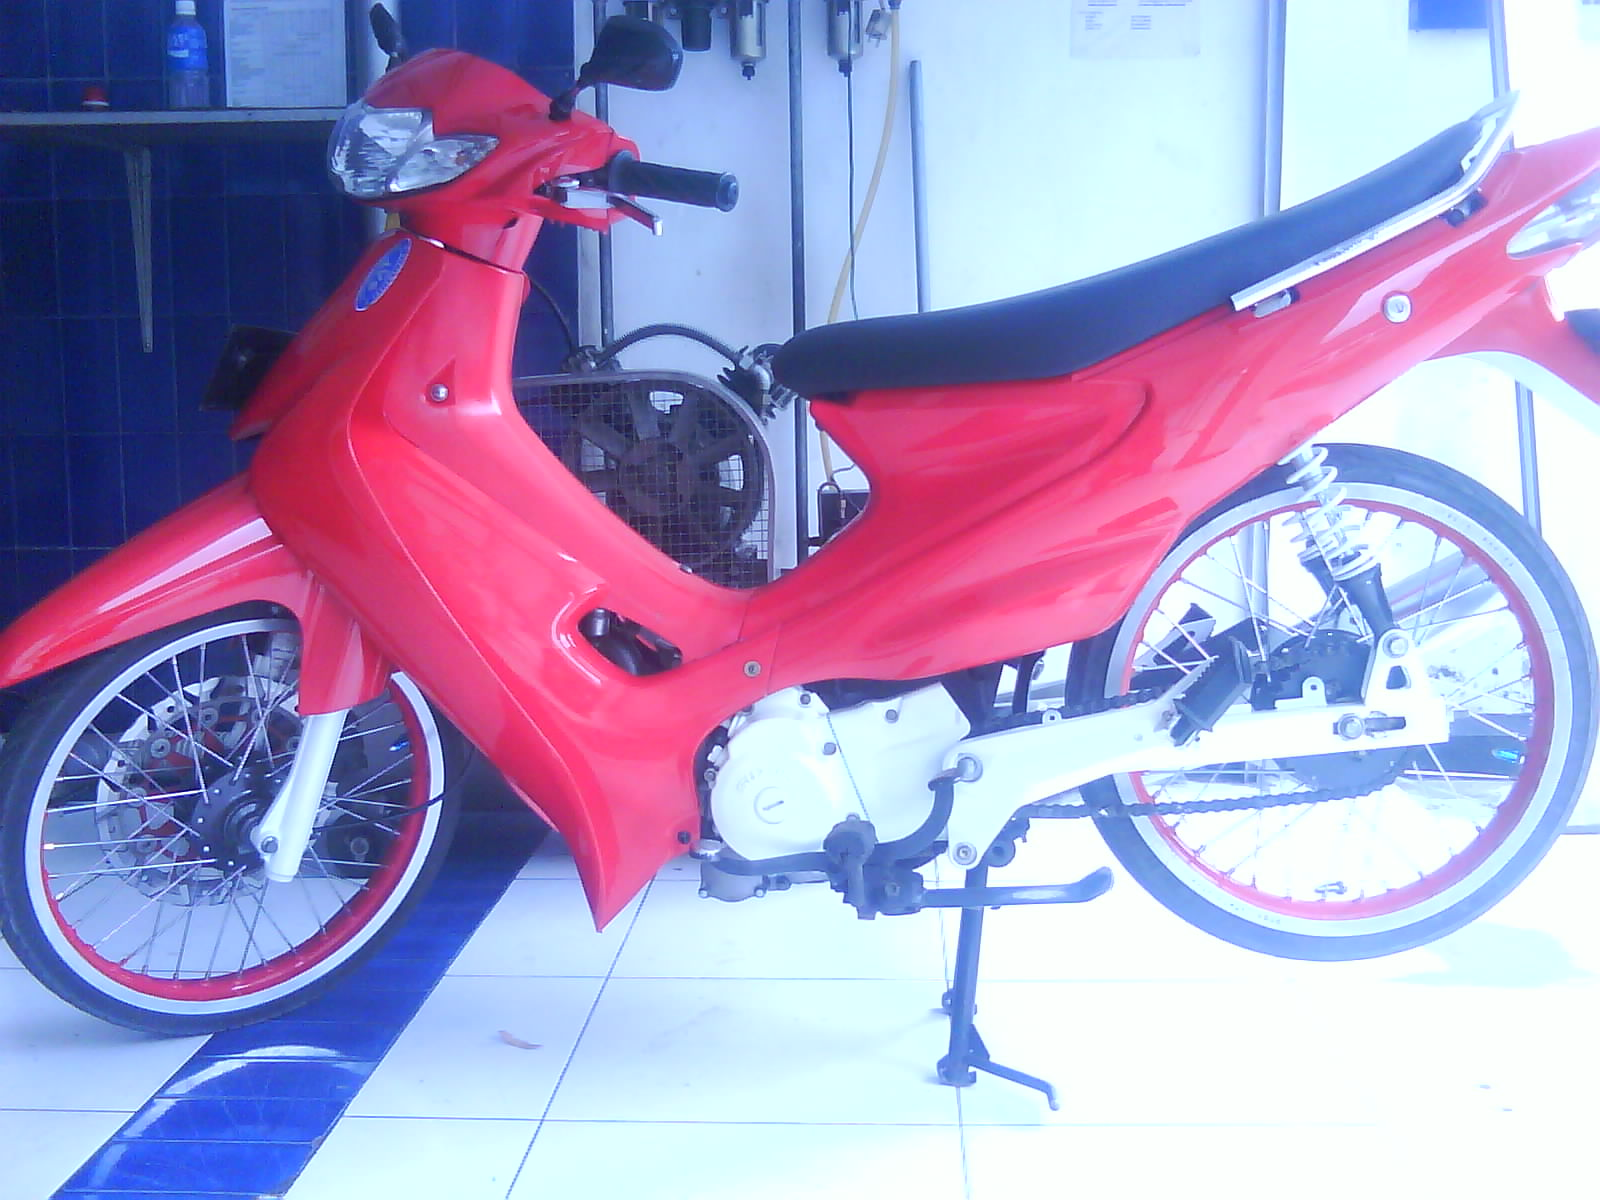 Modif Motor: Suzuki Smash Modification At Malang Indonesia